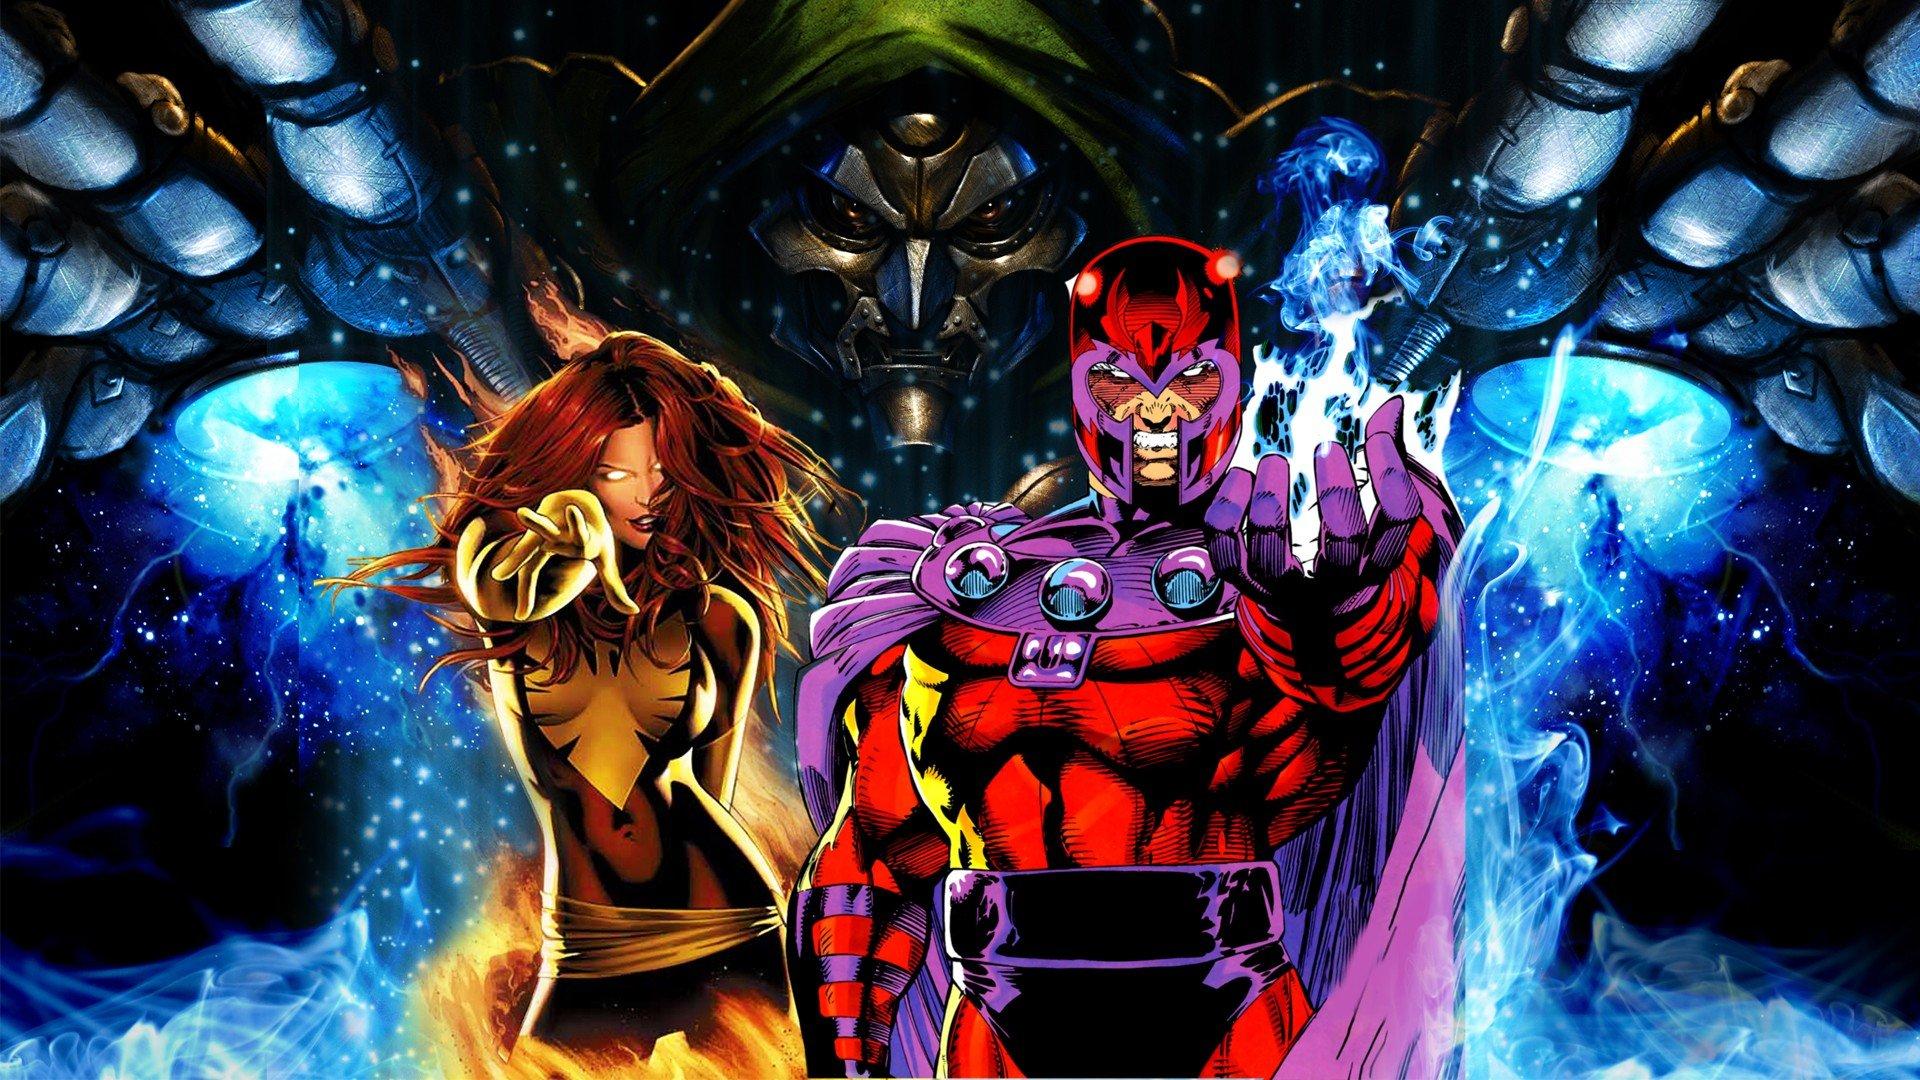 Free Download Dr Doom Marvel Dark Phoenix Mitsubishi Evo